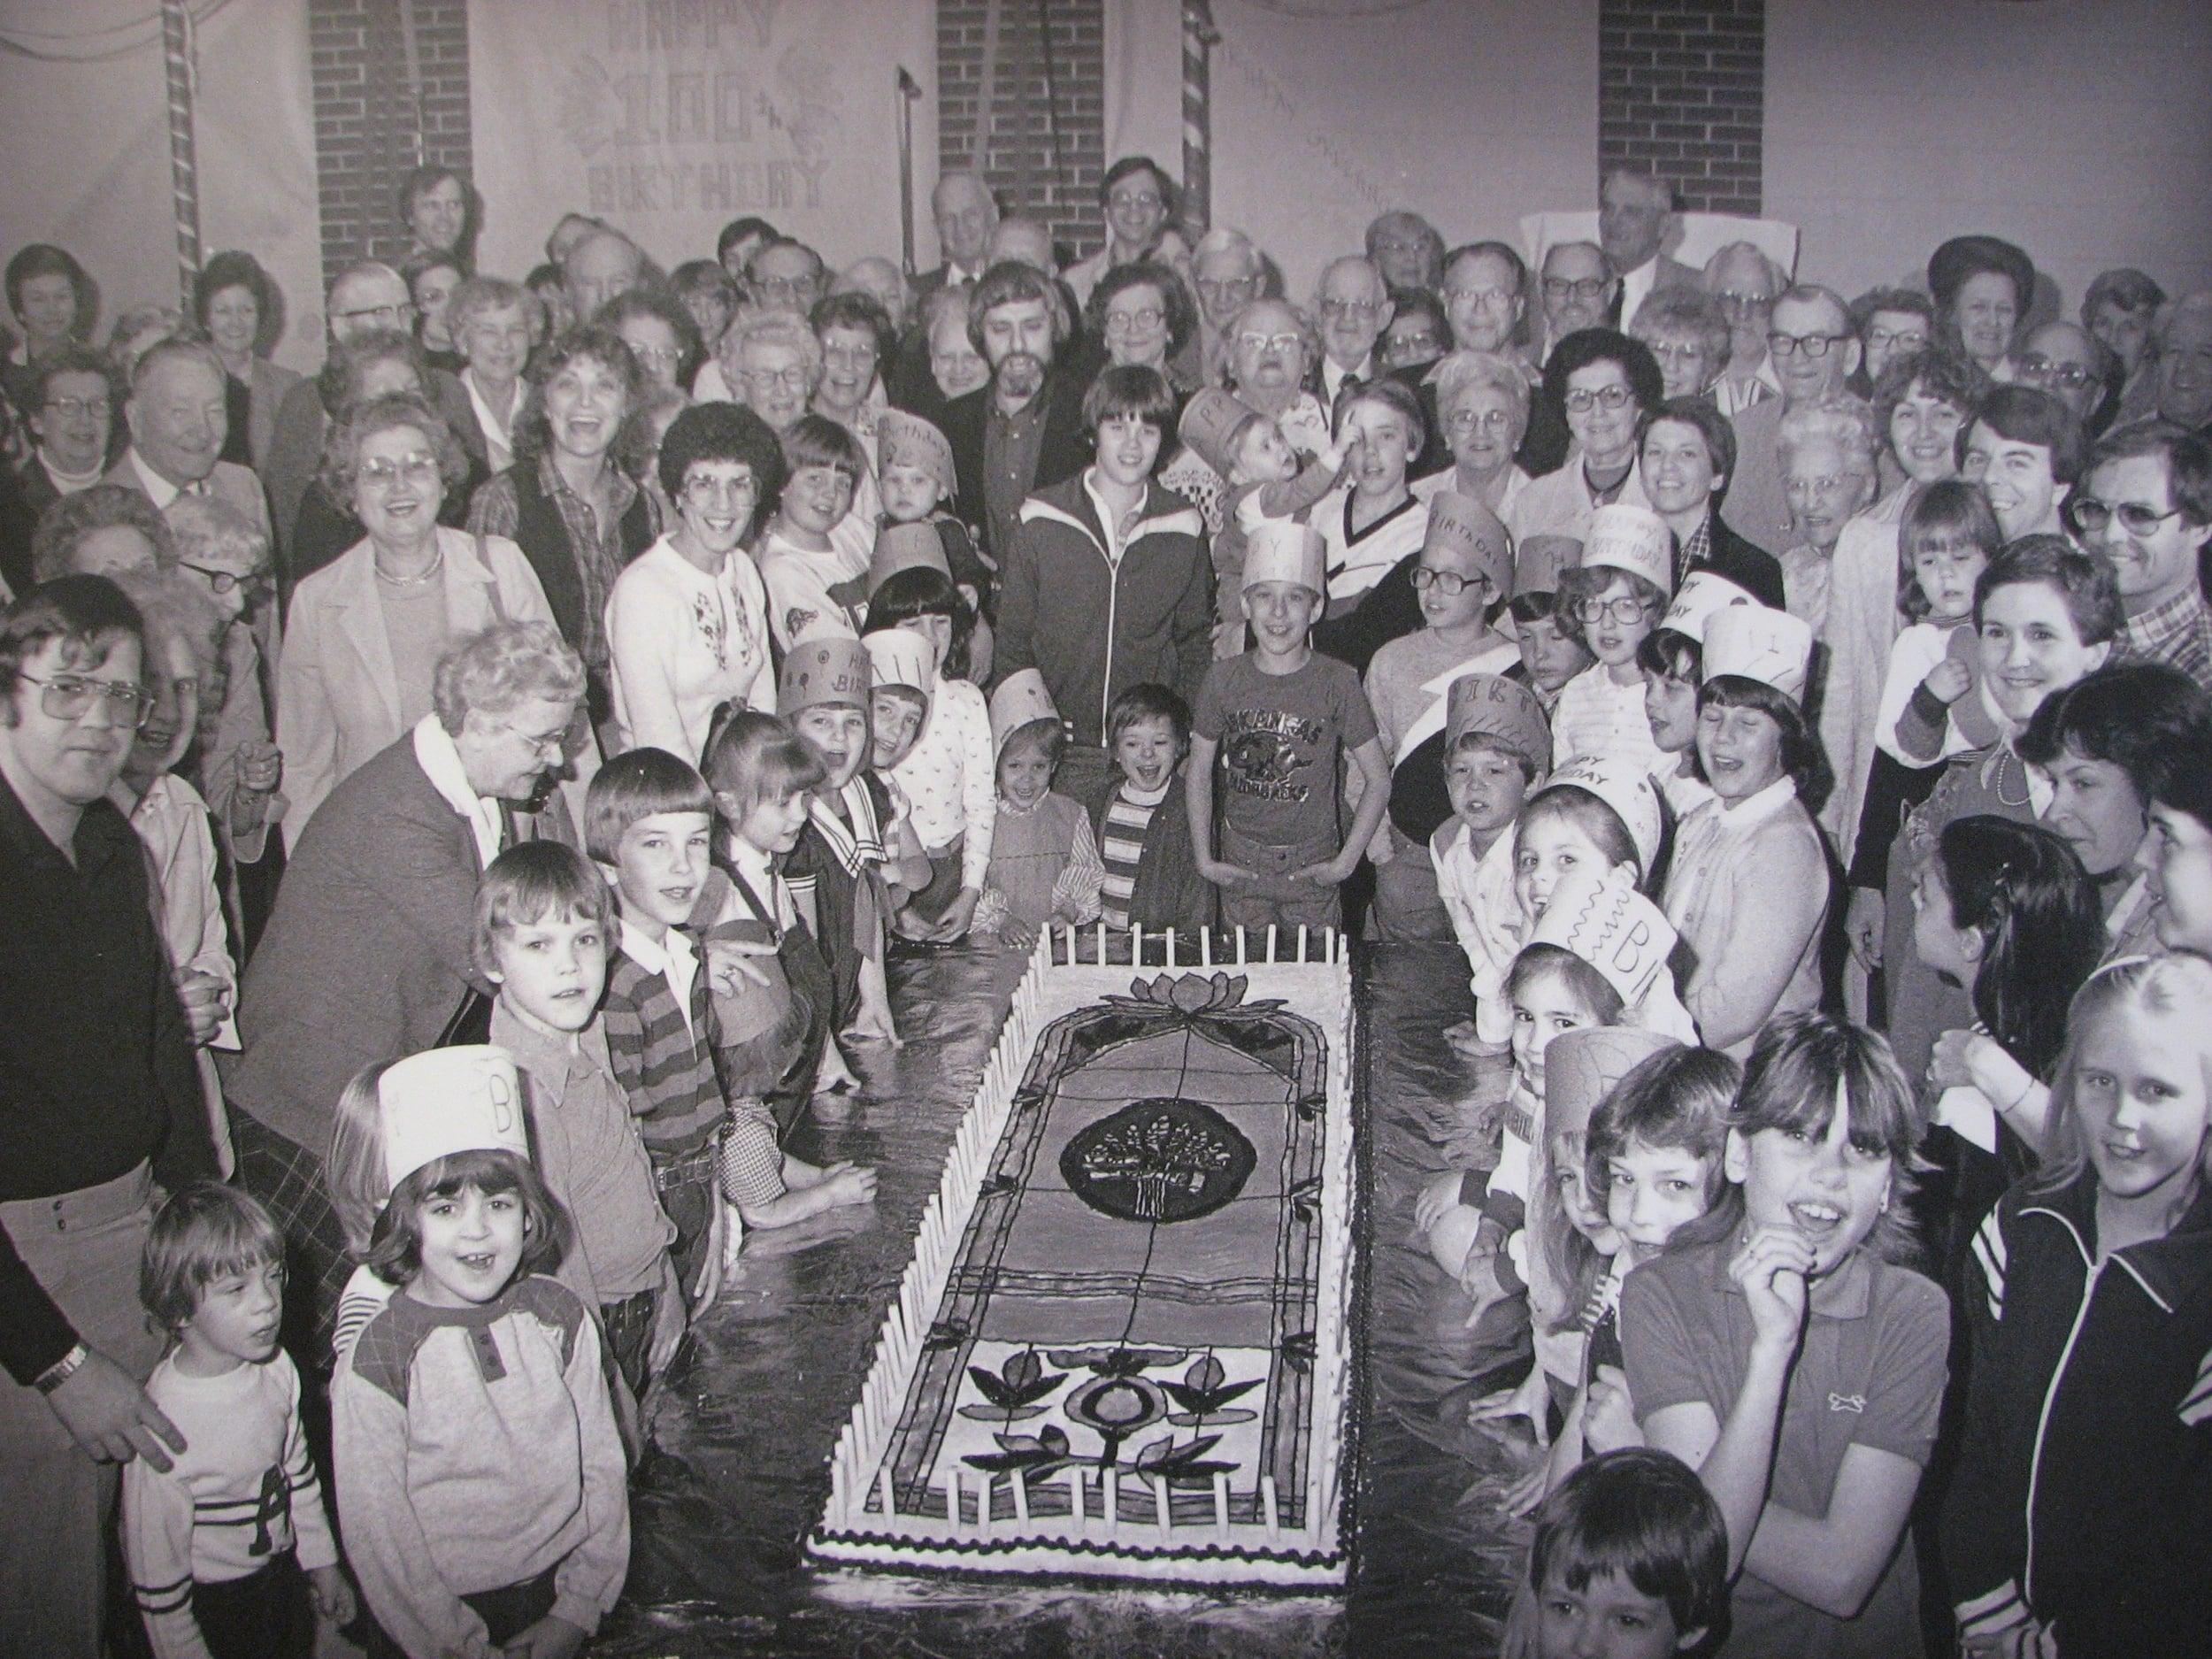 CUMC Centennial Celebration in 1981.